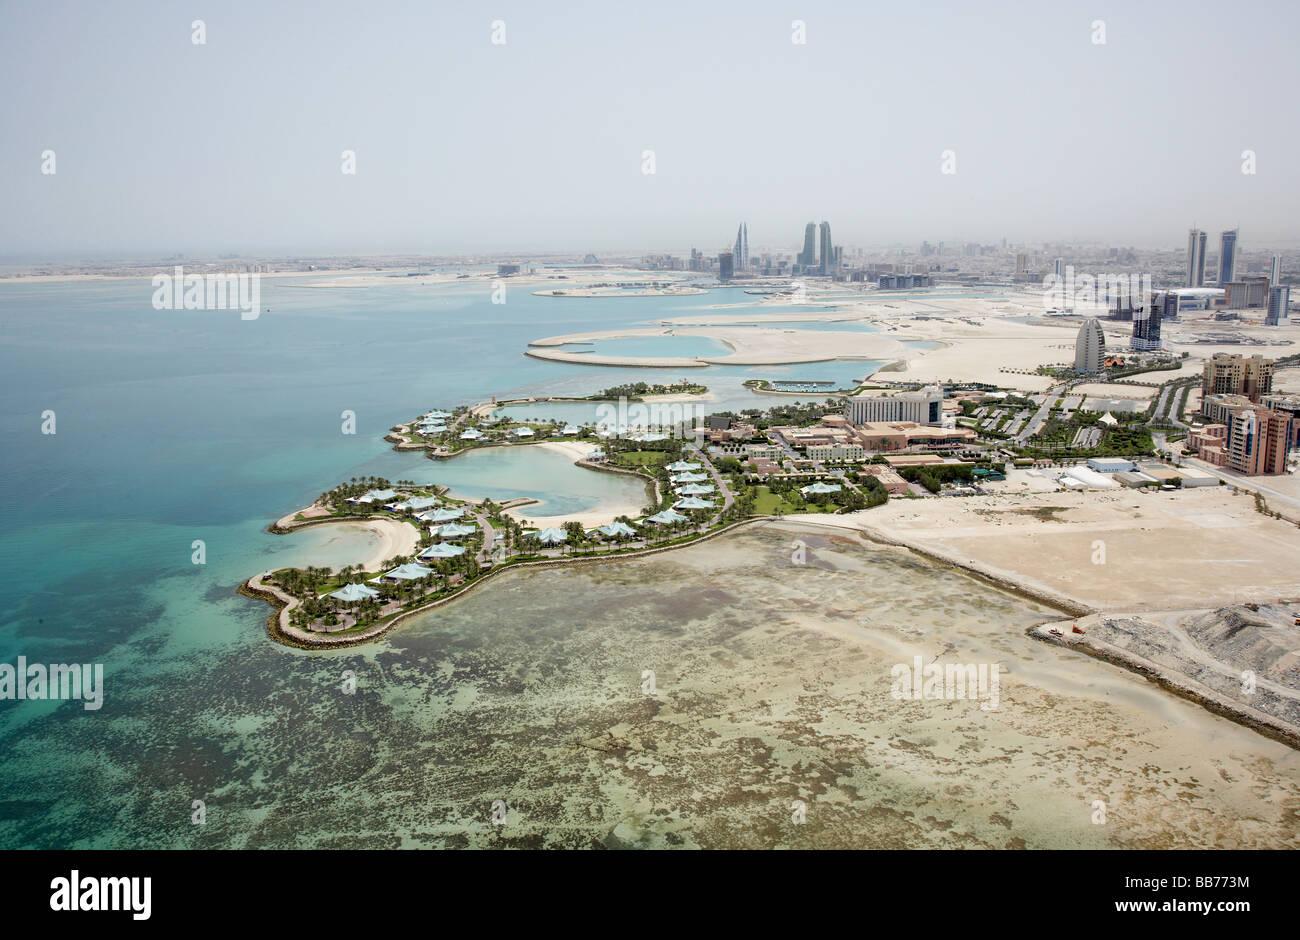 Aerial photograph of the Ritz Carlton Hotel and resort Manama Bahrain - Stock Image